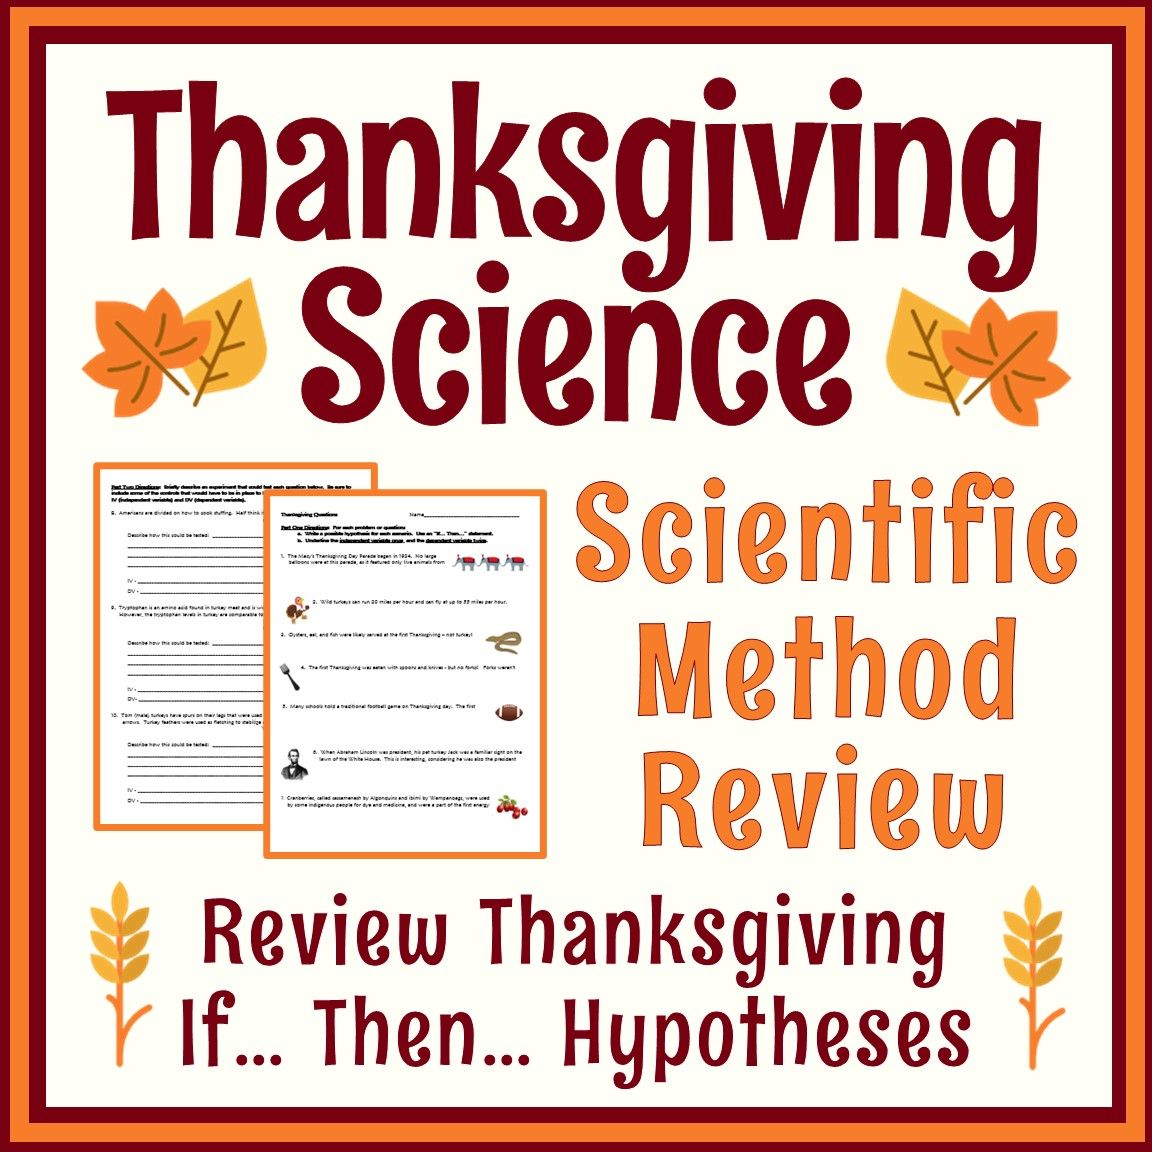 Thanksgiving Science Activity Scientific Method Hypothesis Variables Scientific Method Science Activities Scientific Method Worksheet